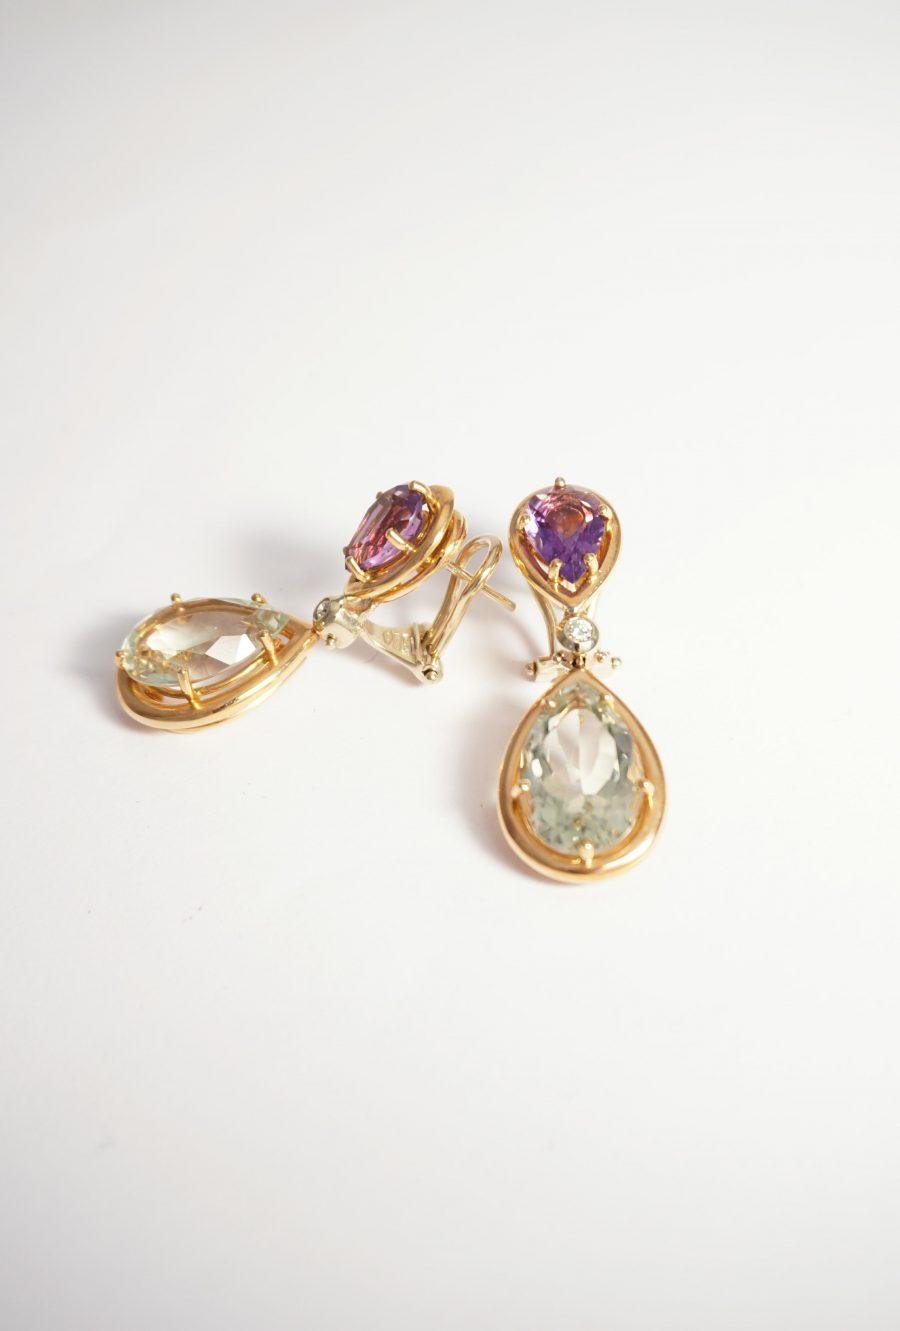 prasiolitas verdes amatistas oro y diamantes